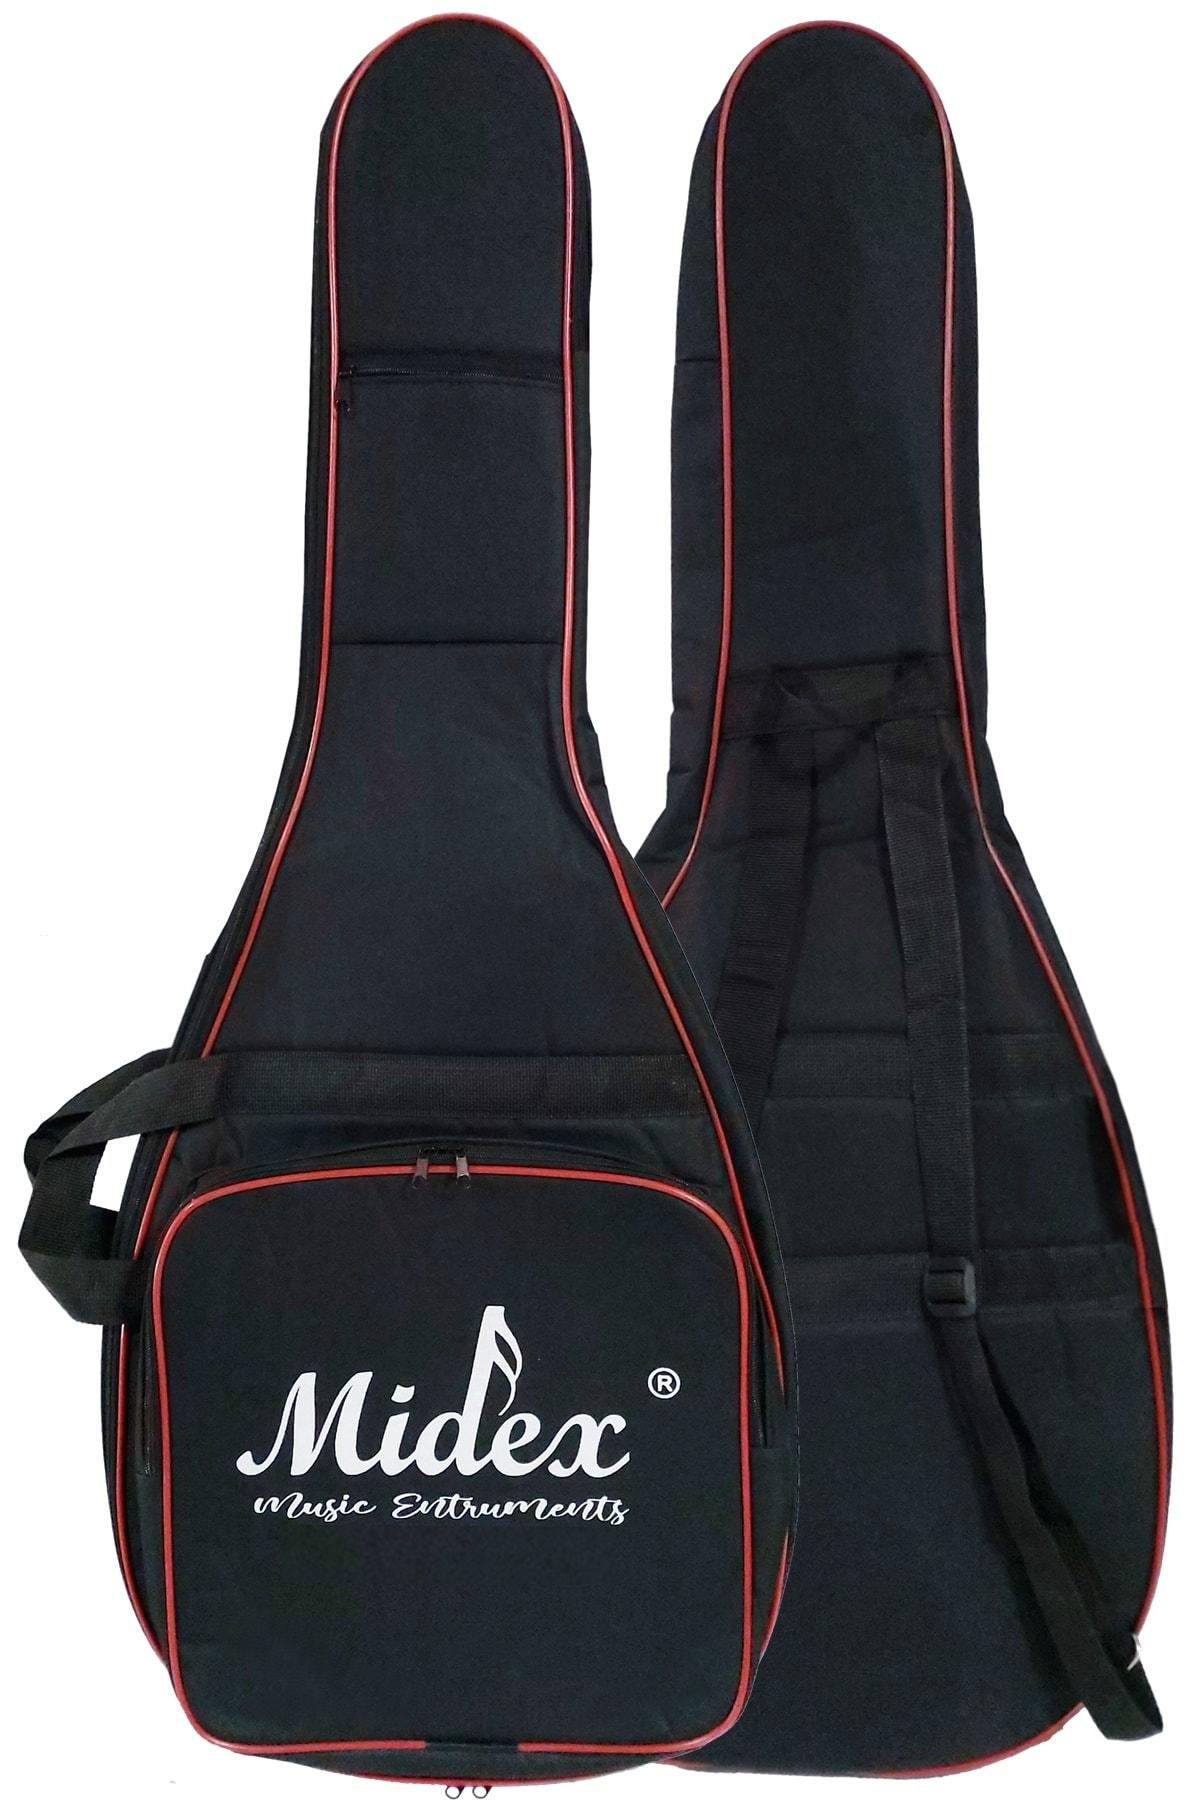 Midex Cls-40 Klasik Gitar Çanta Soft Case (KALIN KILIF)